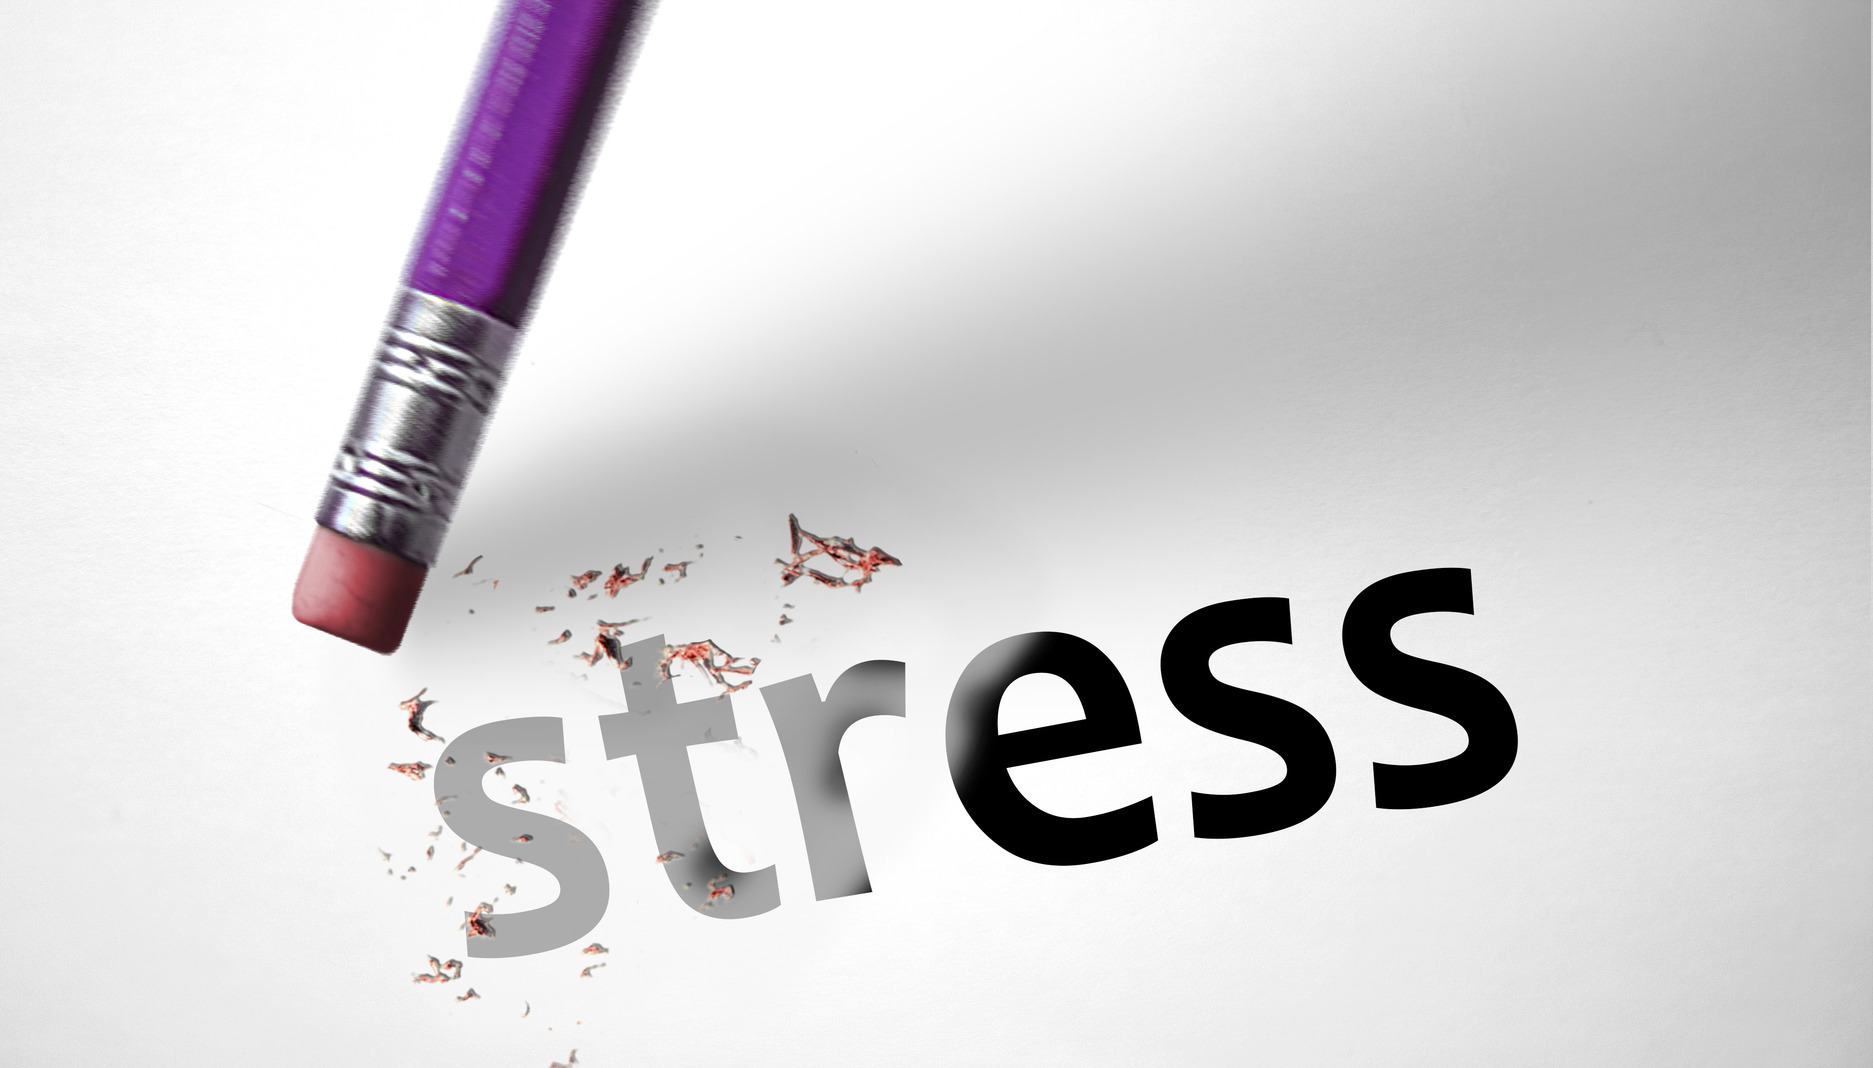 Eraser deleting the word Stress